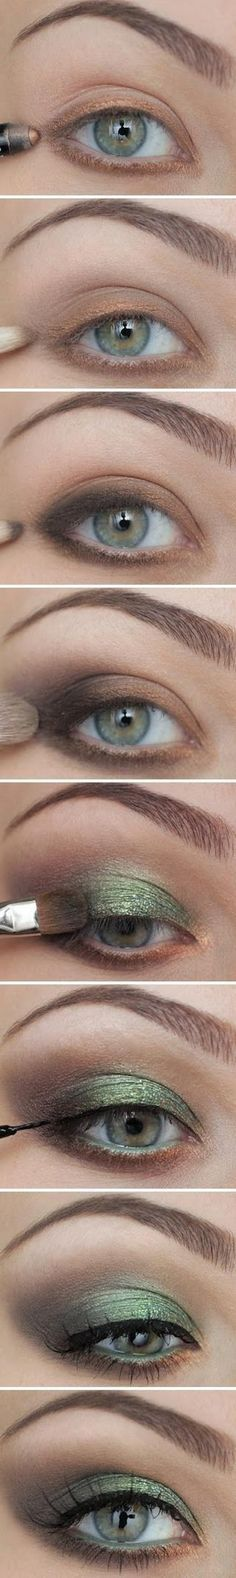 make up bij groene ogen